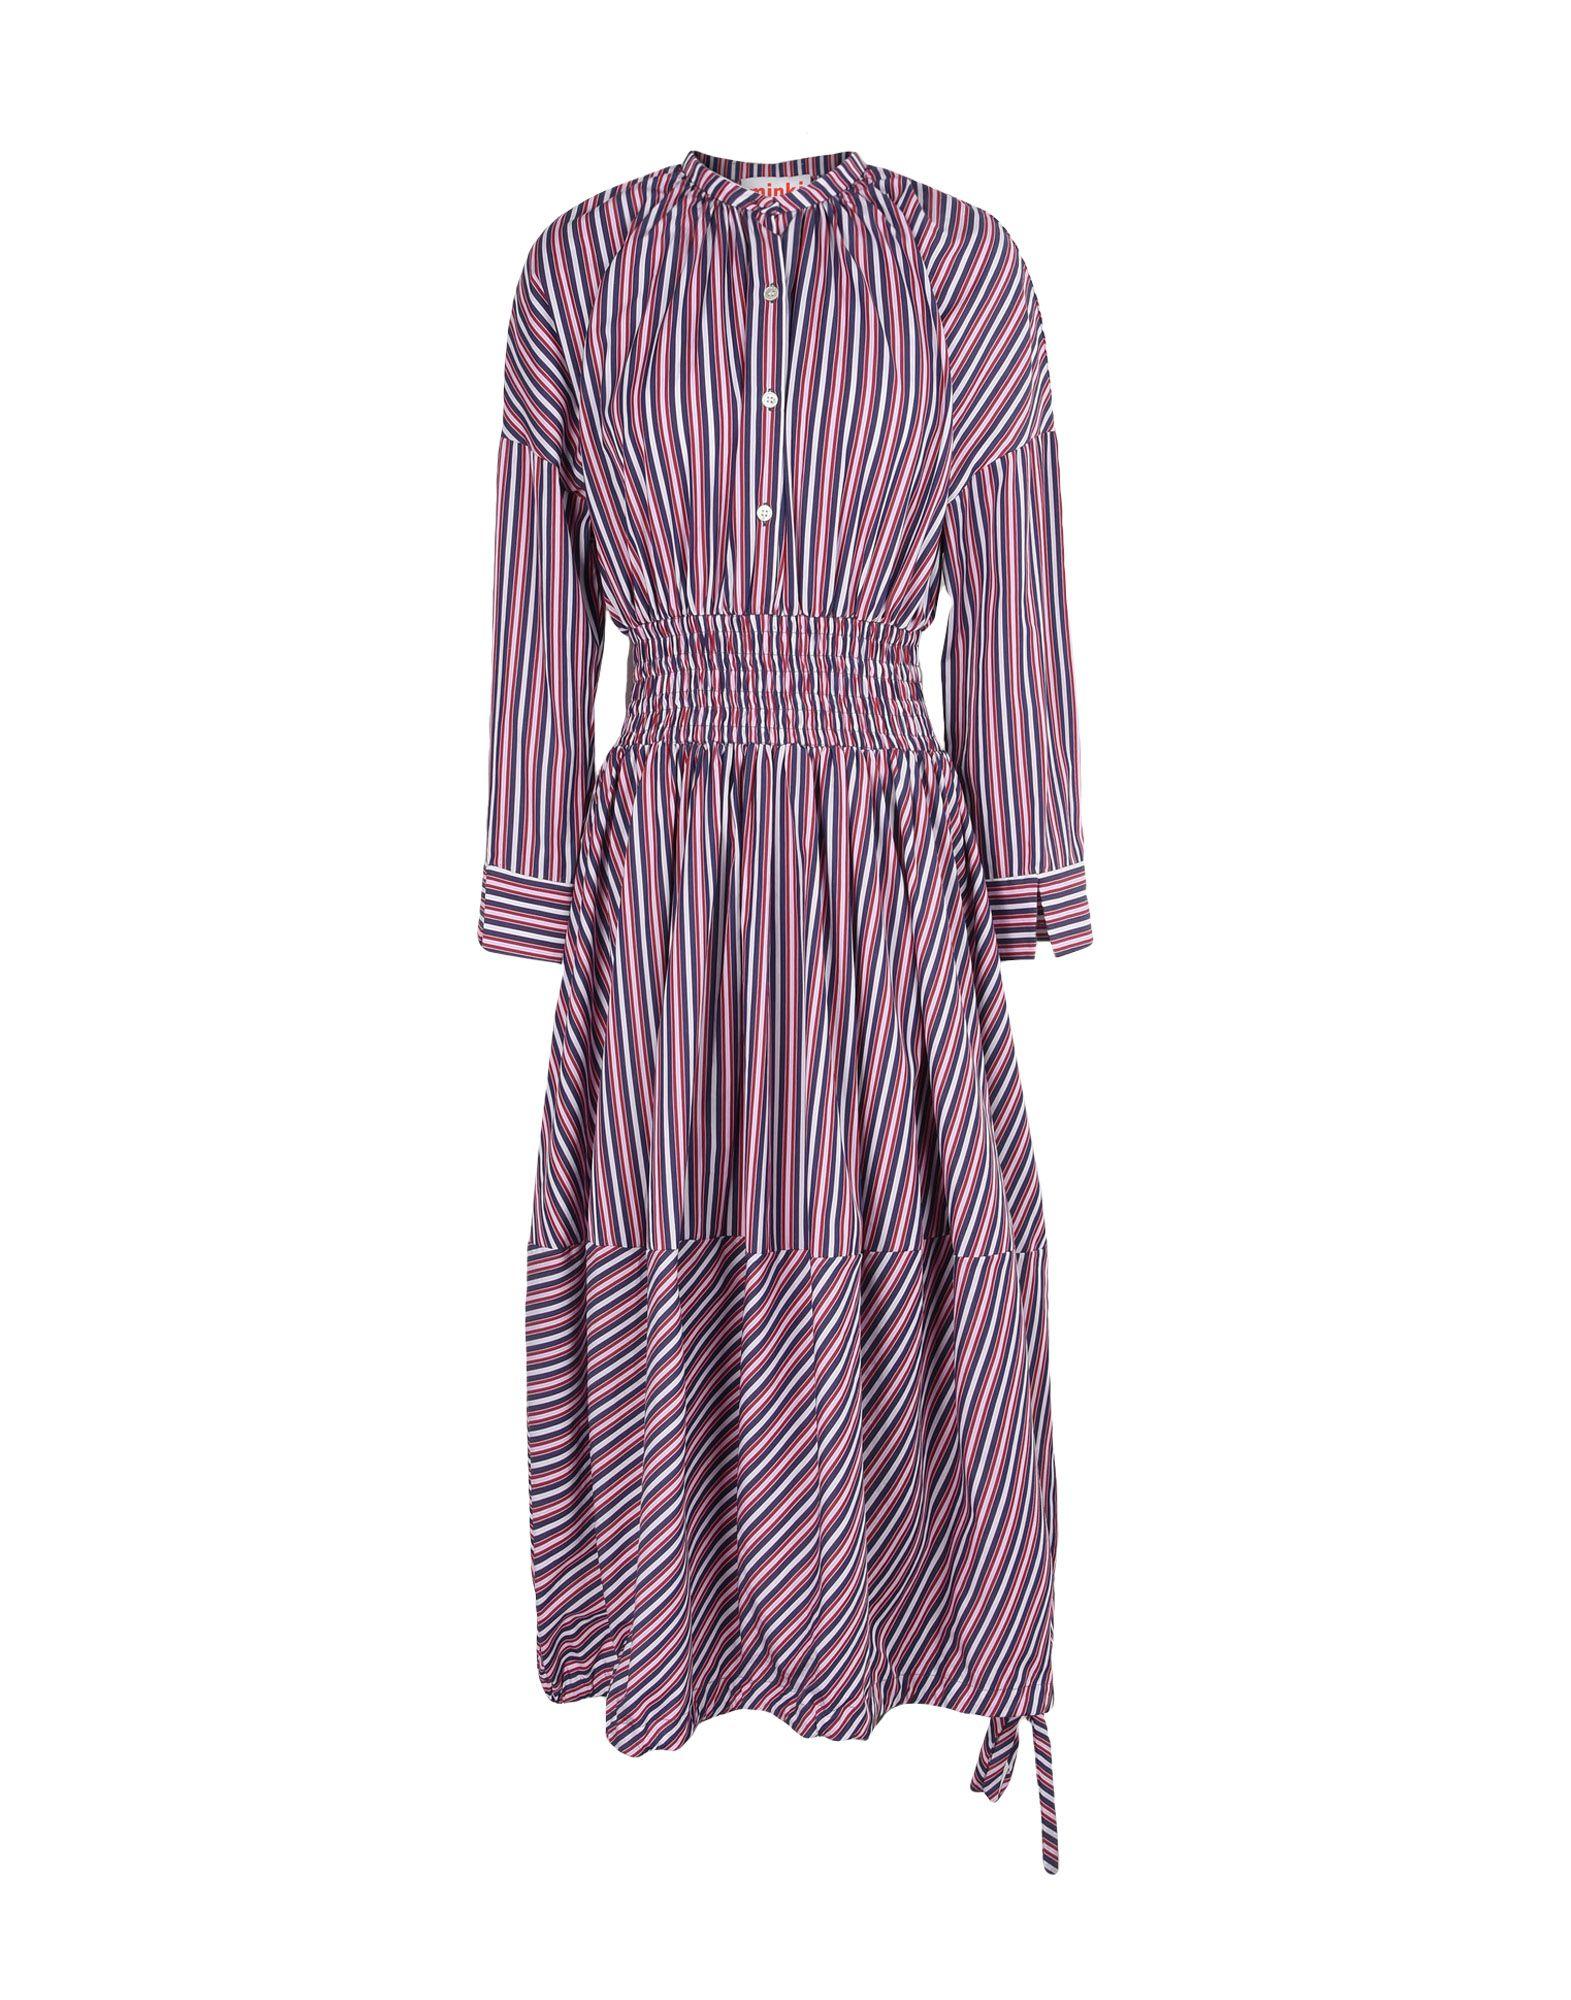 MINKI CHENG Платье длиной 3/4 cheng pk